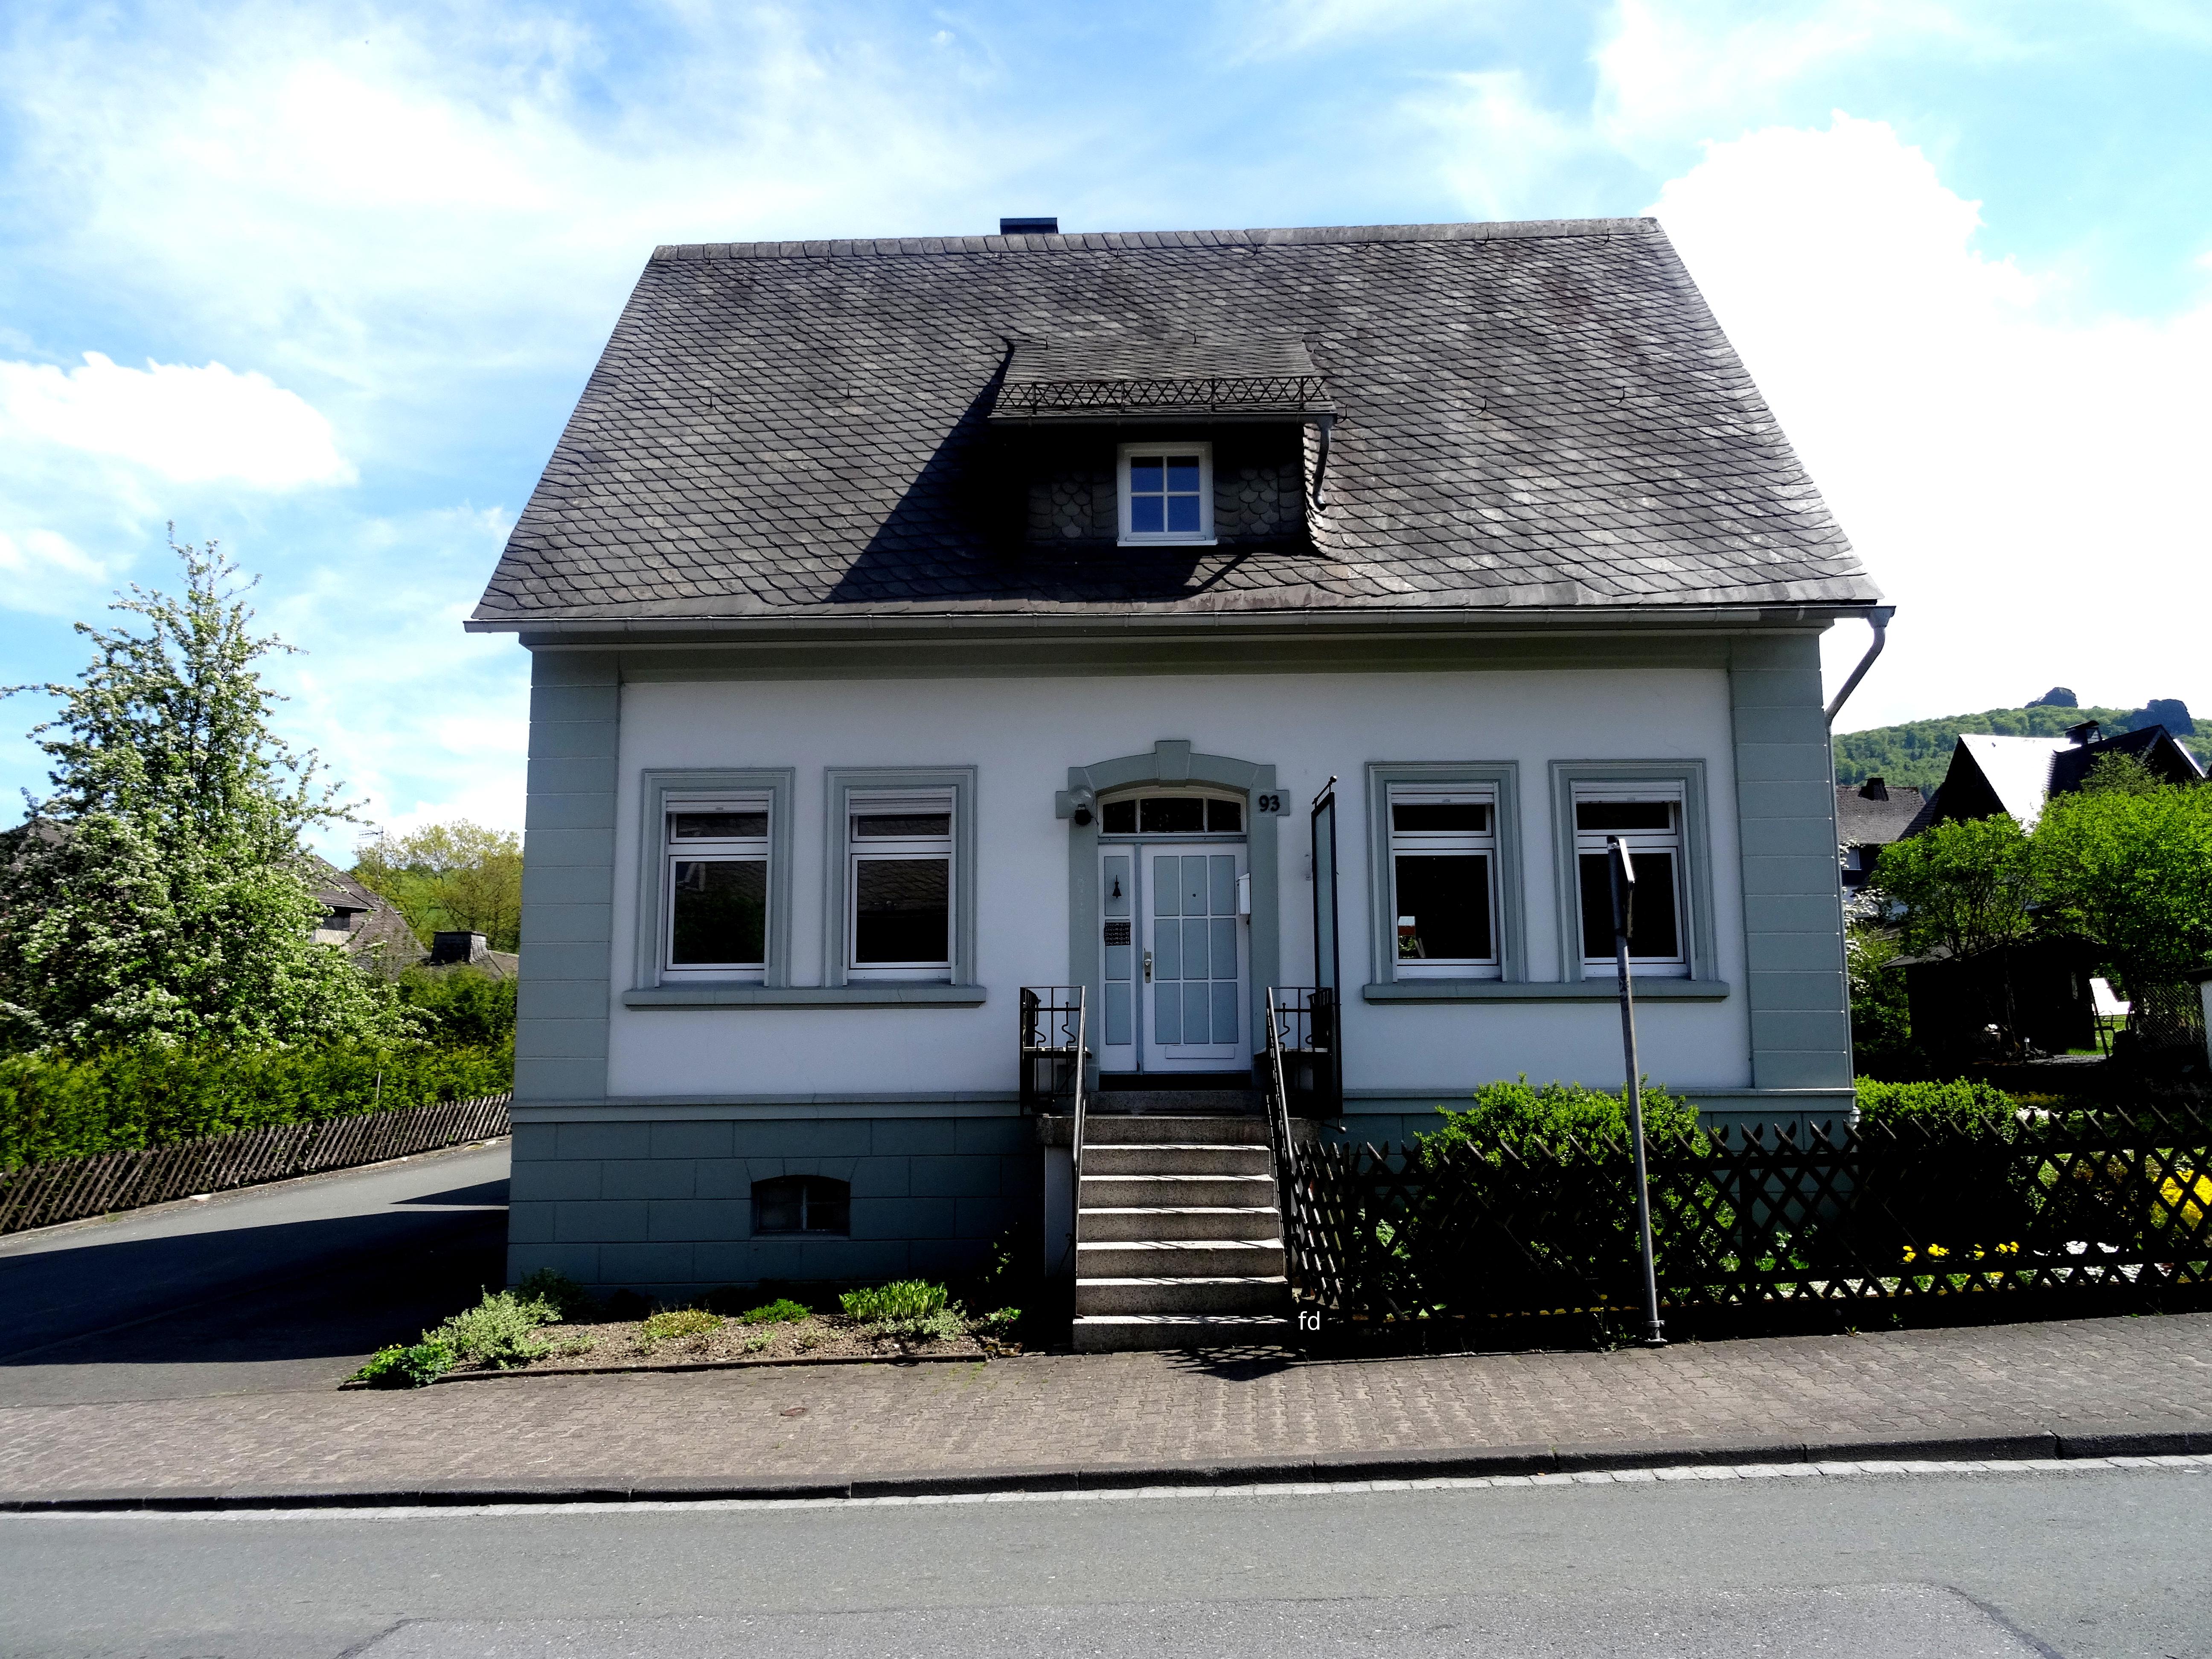 Datei:Kleinhaus Elleringhauser Str.93 fd.JPG – Wikipedia